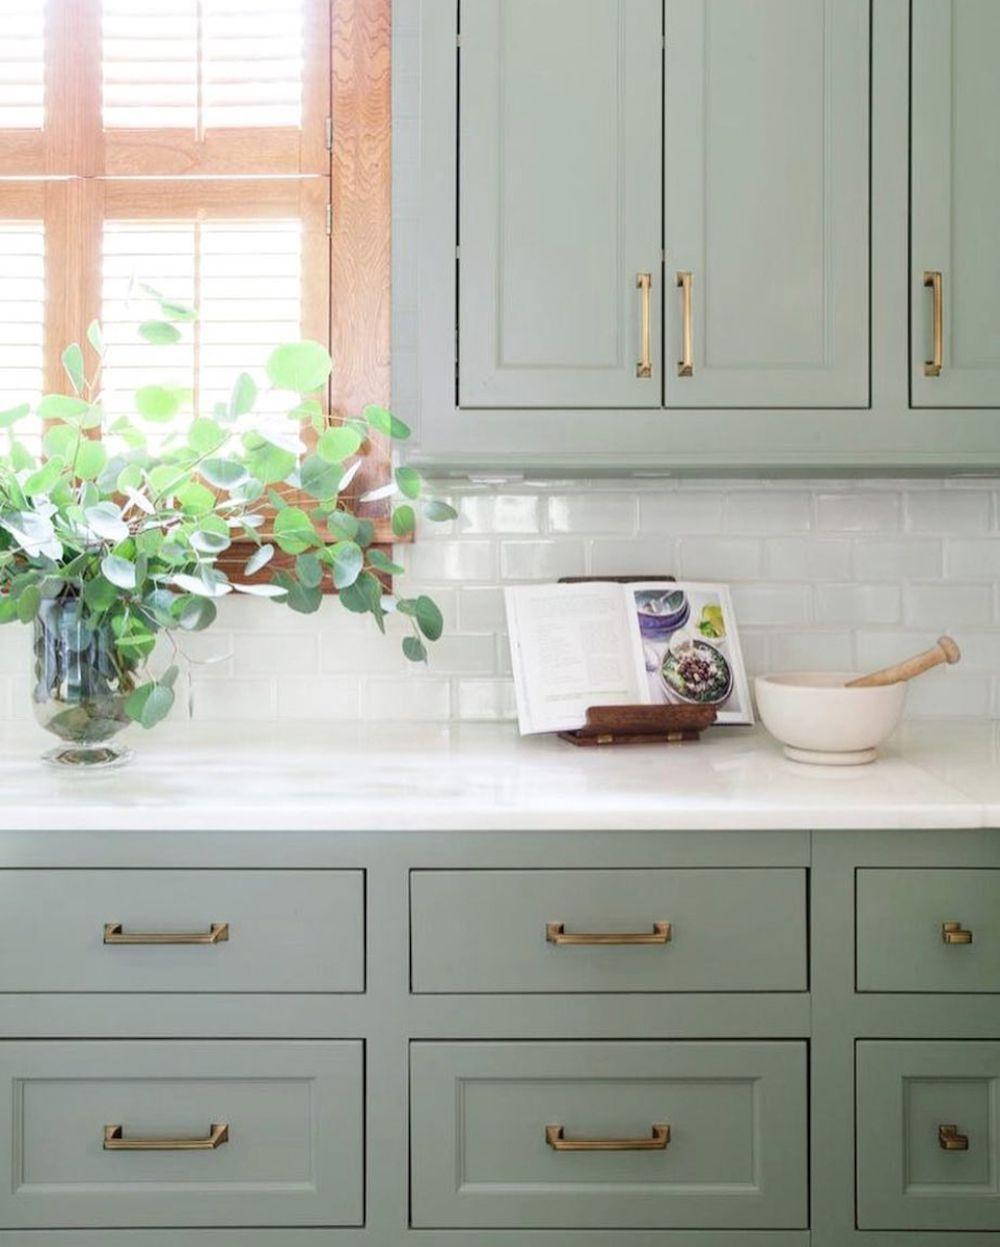 51 Green Kitchen Designs: Colour In The Kitchen - FIRST SENSE